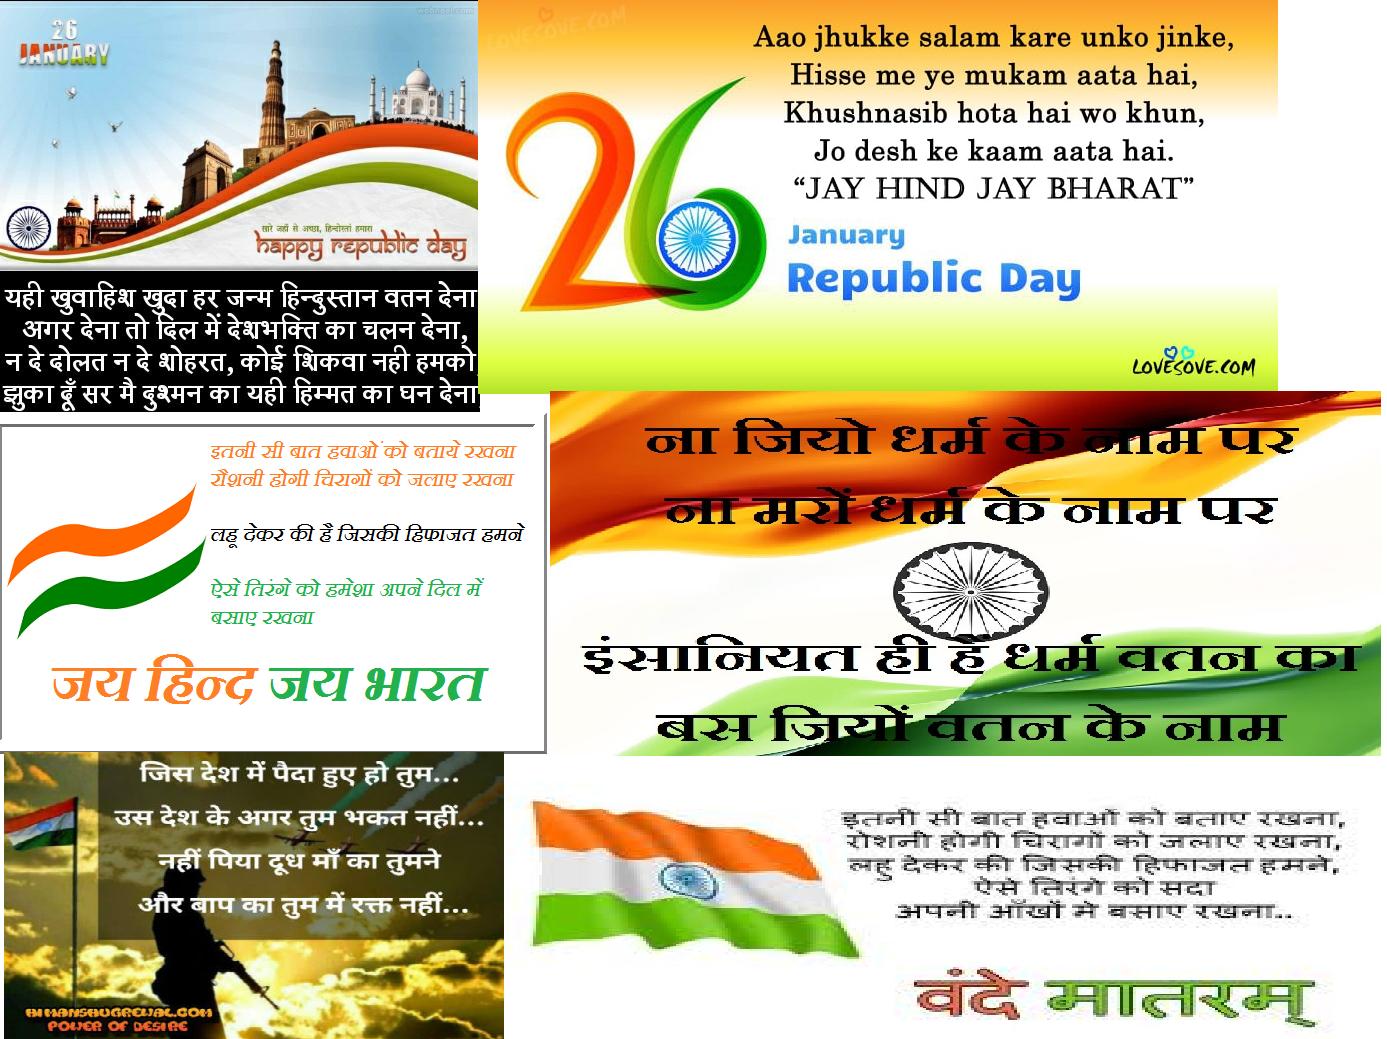 Republic Day Shayari In Hindi 2019 Language 26 January